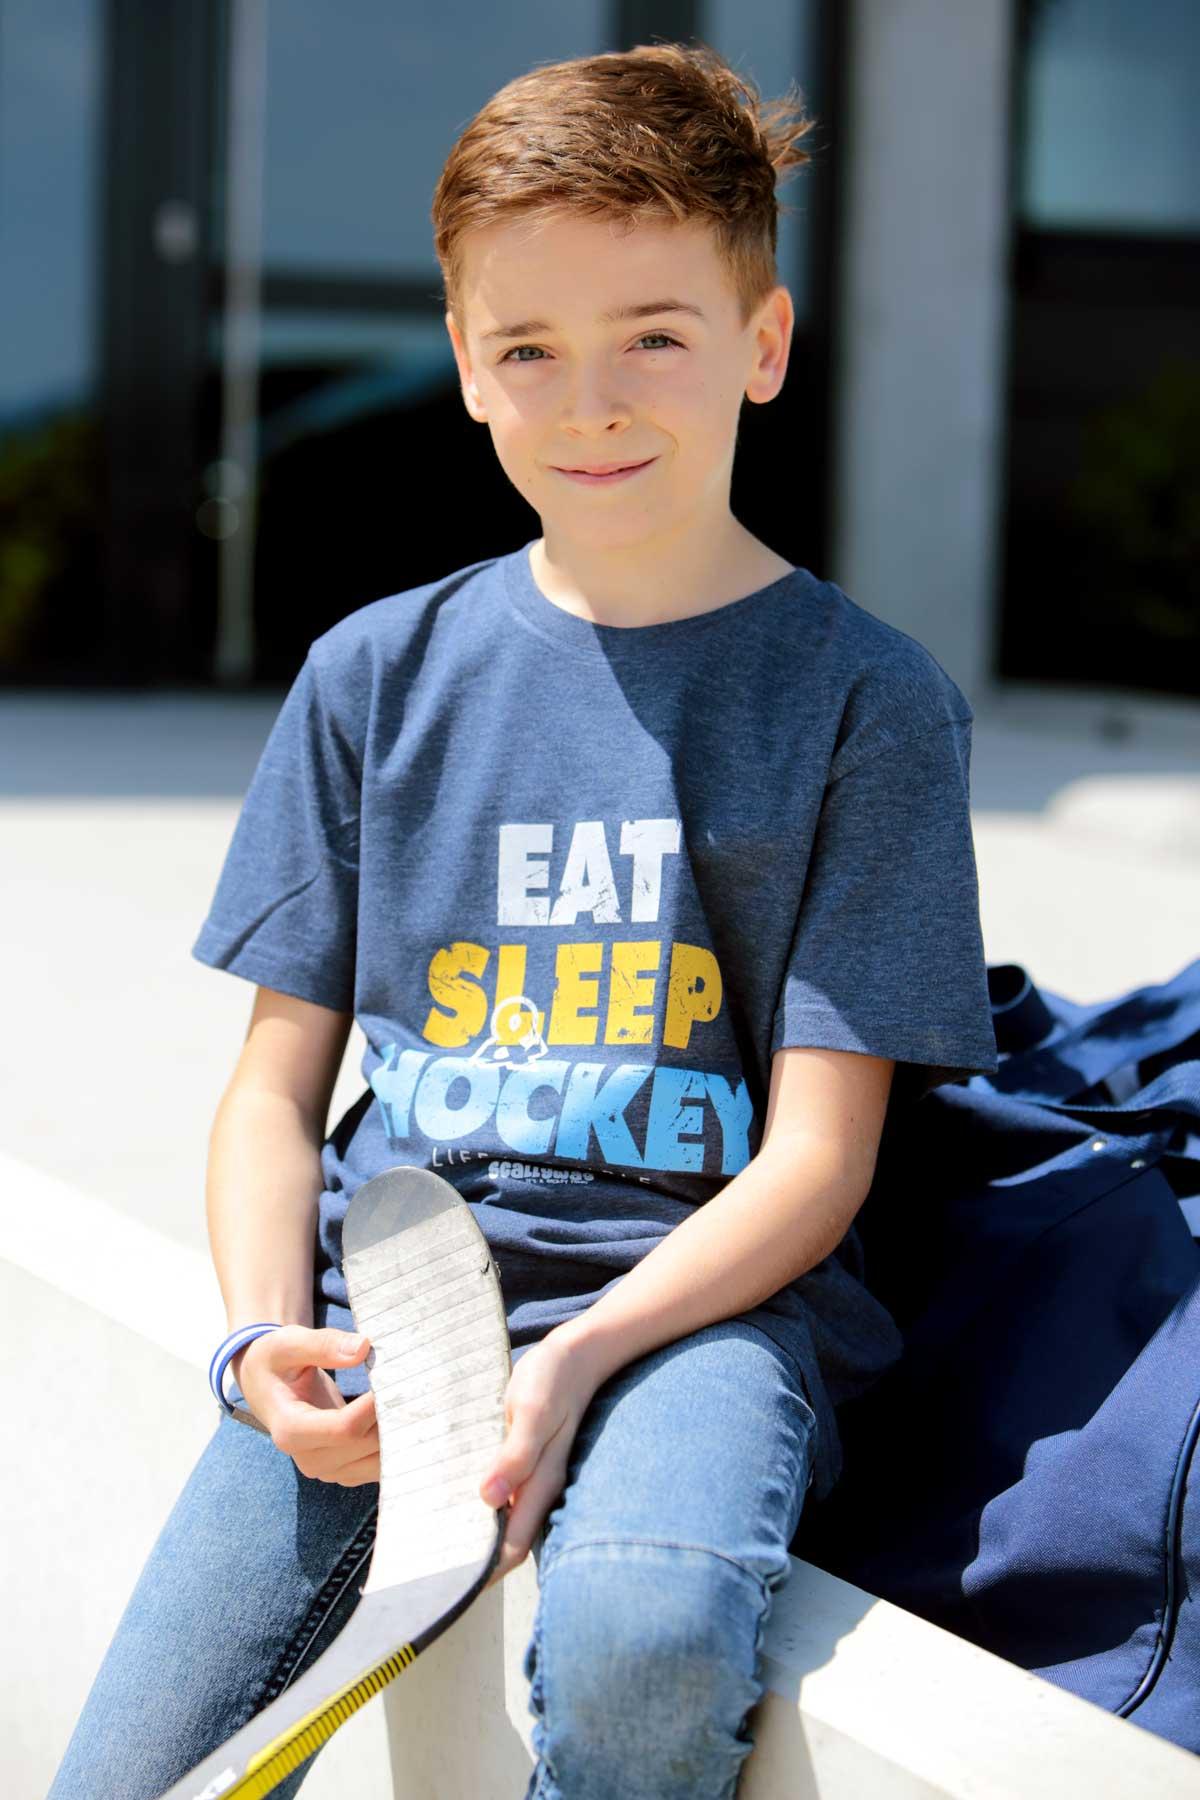 SCALLYWAG® HOCKEY T-Shirt Kids EAT SLEEP HOCKEY